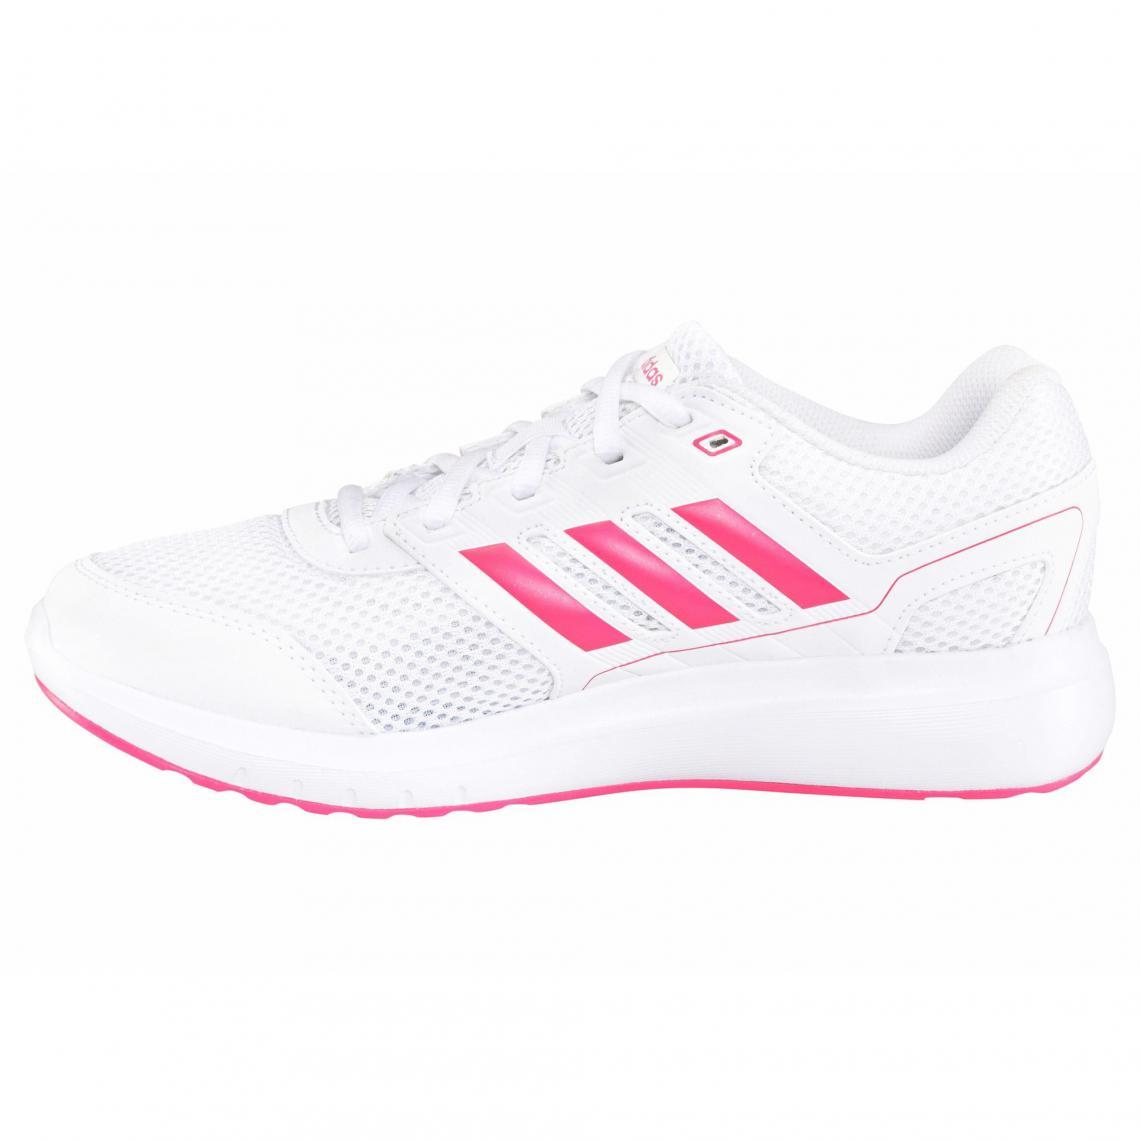 purchase cheap 7ad13 6dde8 Sneakers Adidas Cliquez limage pour lagrandir. adidas Performance Duramo  Lite 2.0 chaussures de running femme - Blanc ...